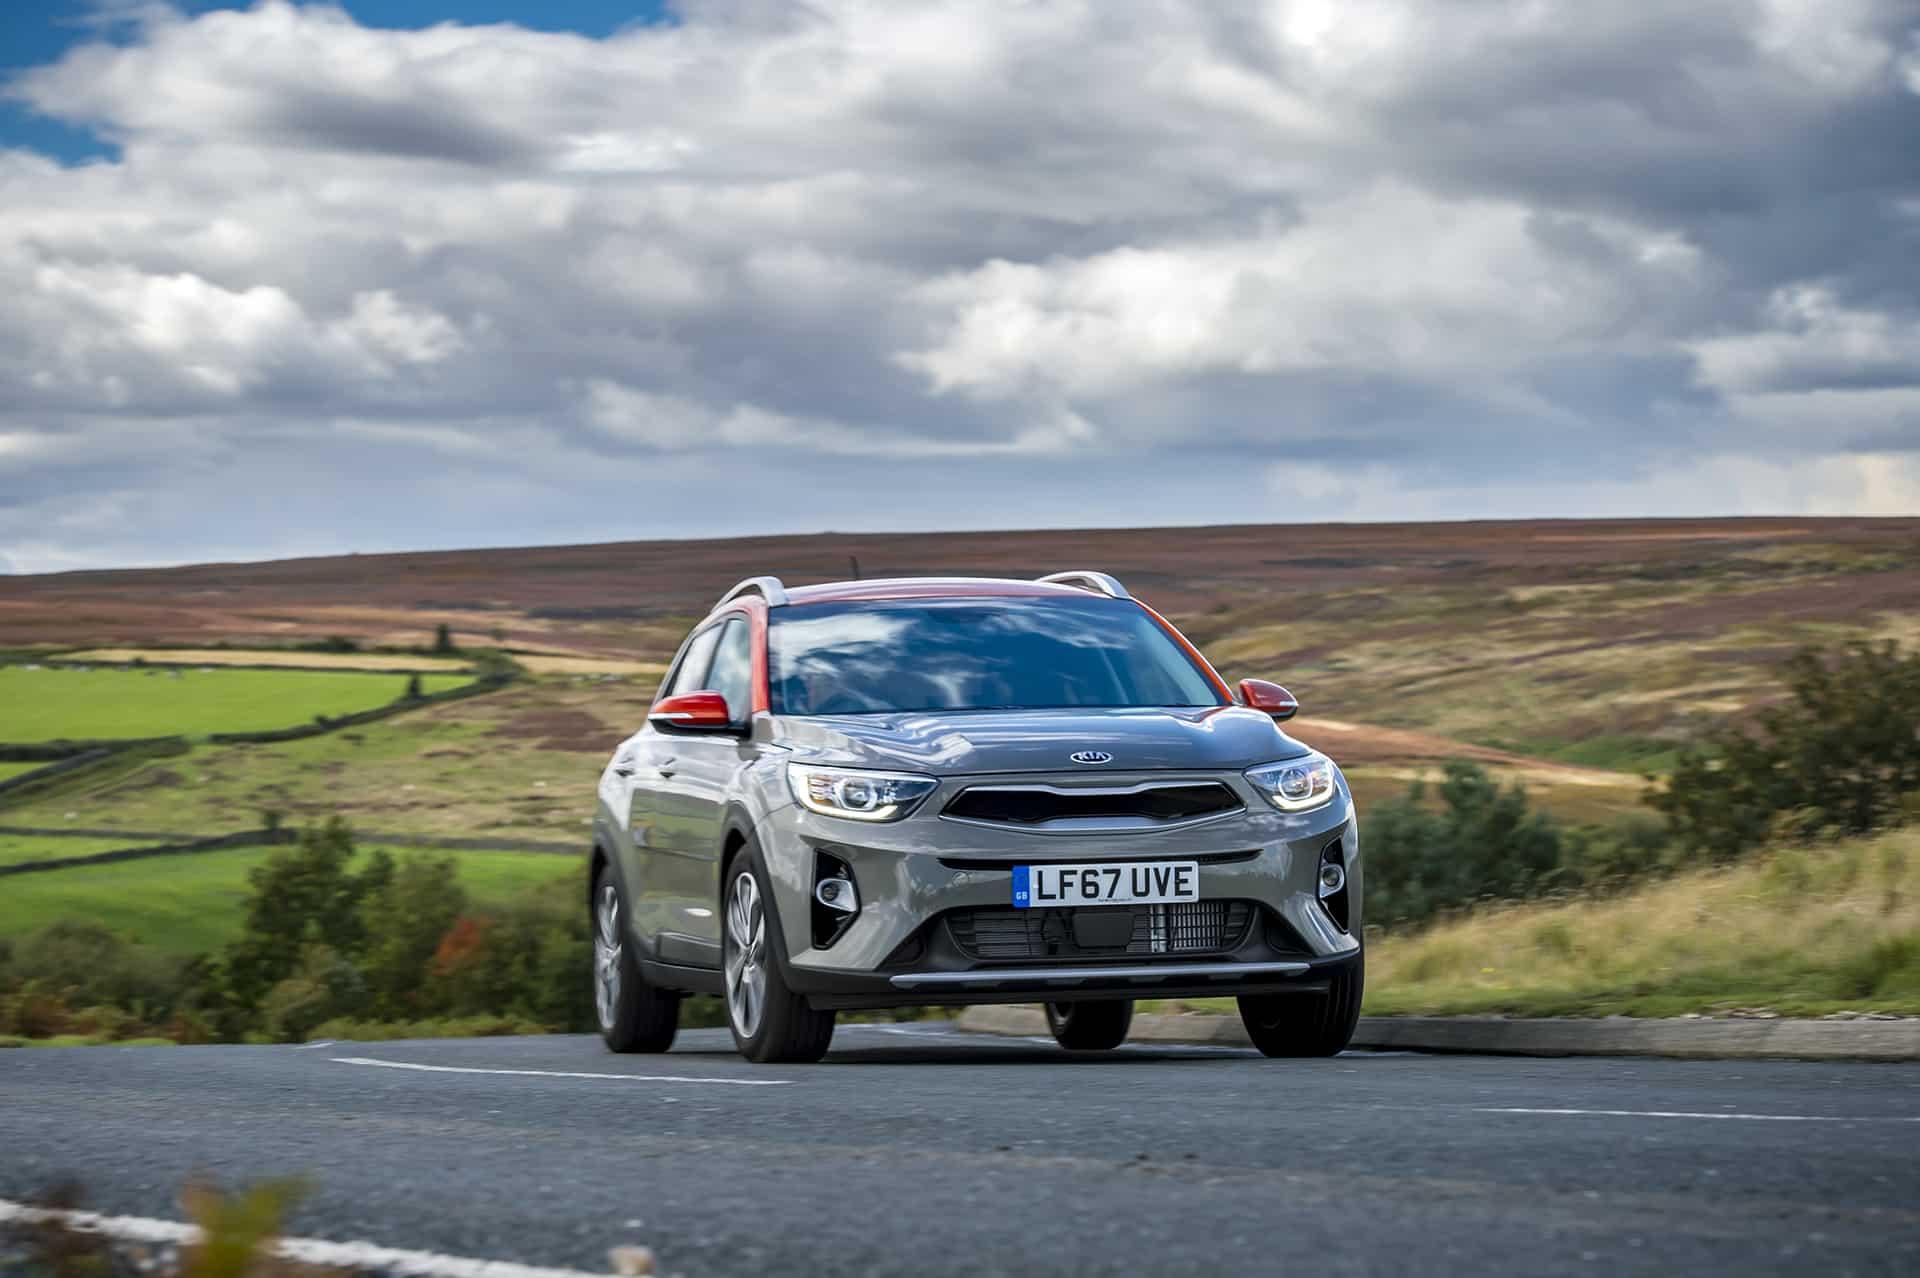 Kia Stonic on road (The Car Expert)